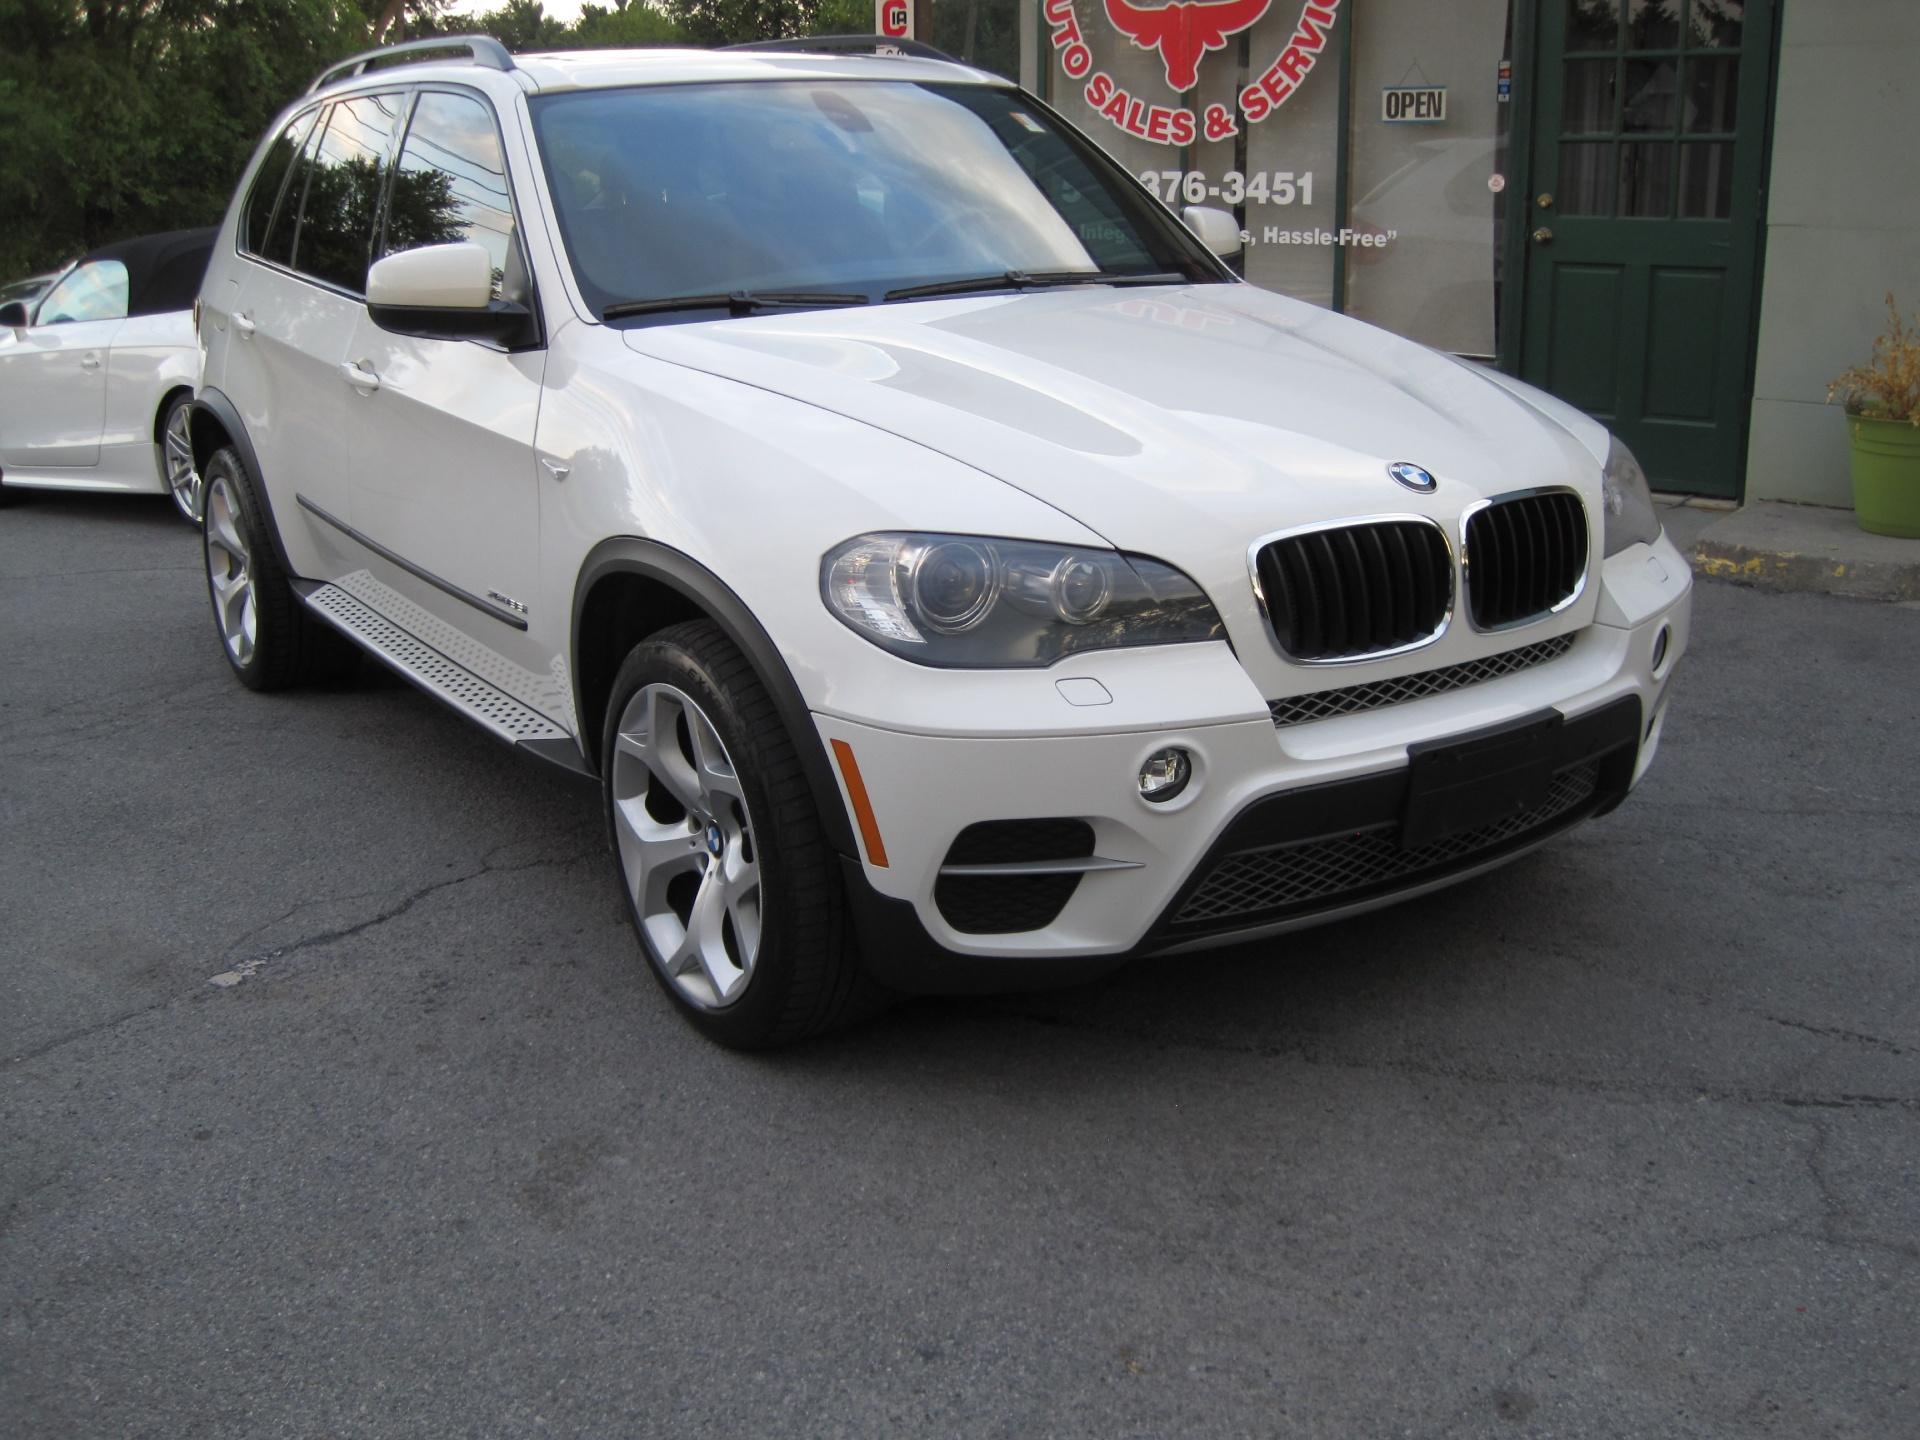 BMW Albany Ny >> 2011 BMW X5 xDrive35i Sport Activity Stock # 15109 for ...